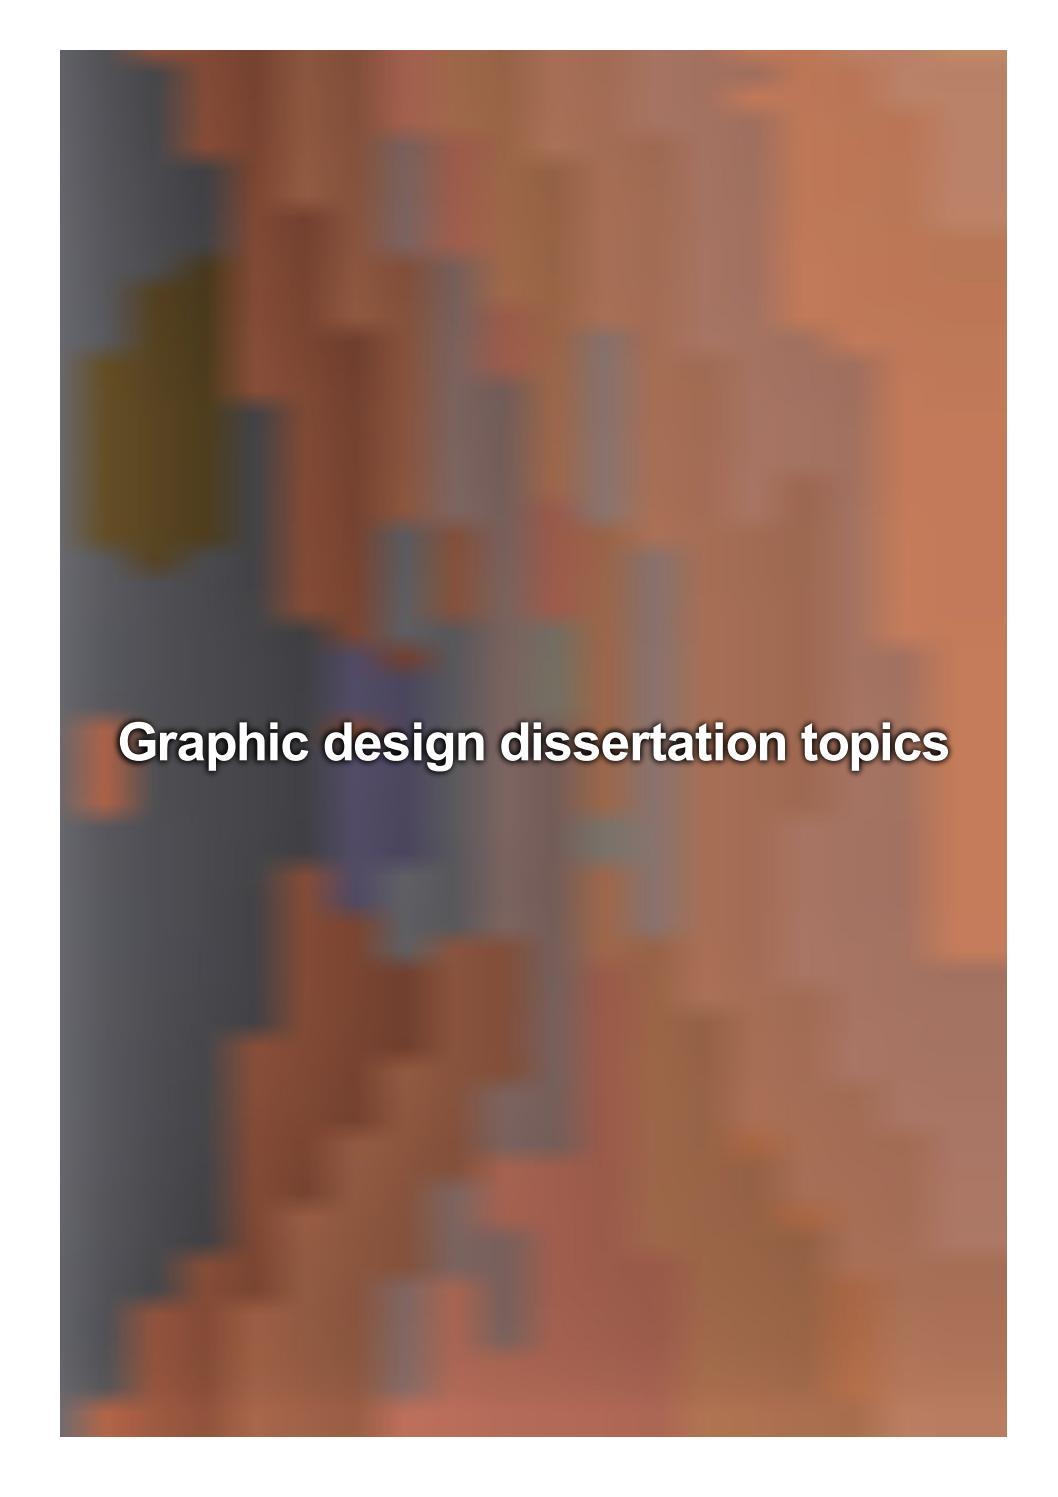 Graphic design dissertation topics dissertation support